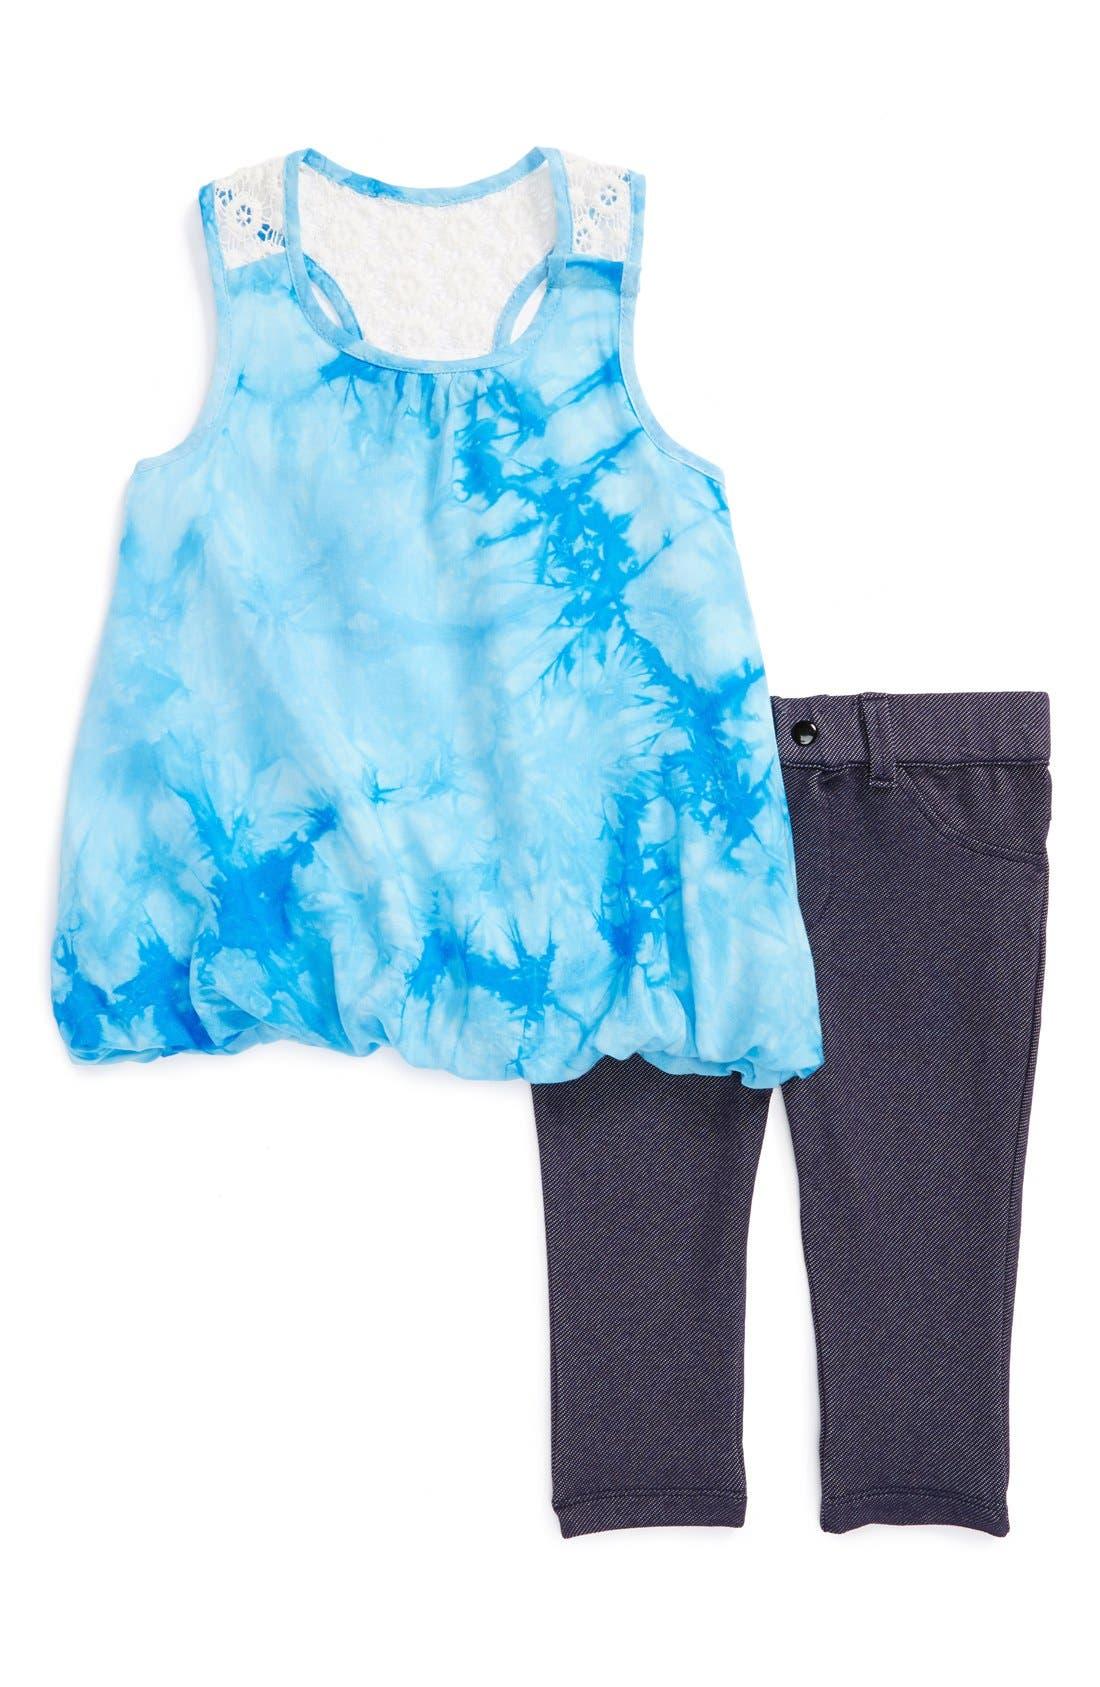 Main Image - Nicole Miller Sleeveless Tunic & Leggings (Baby Girls)